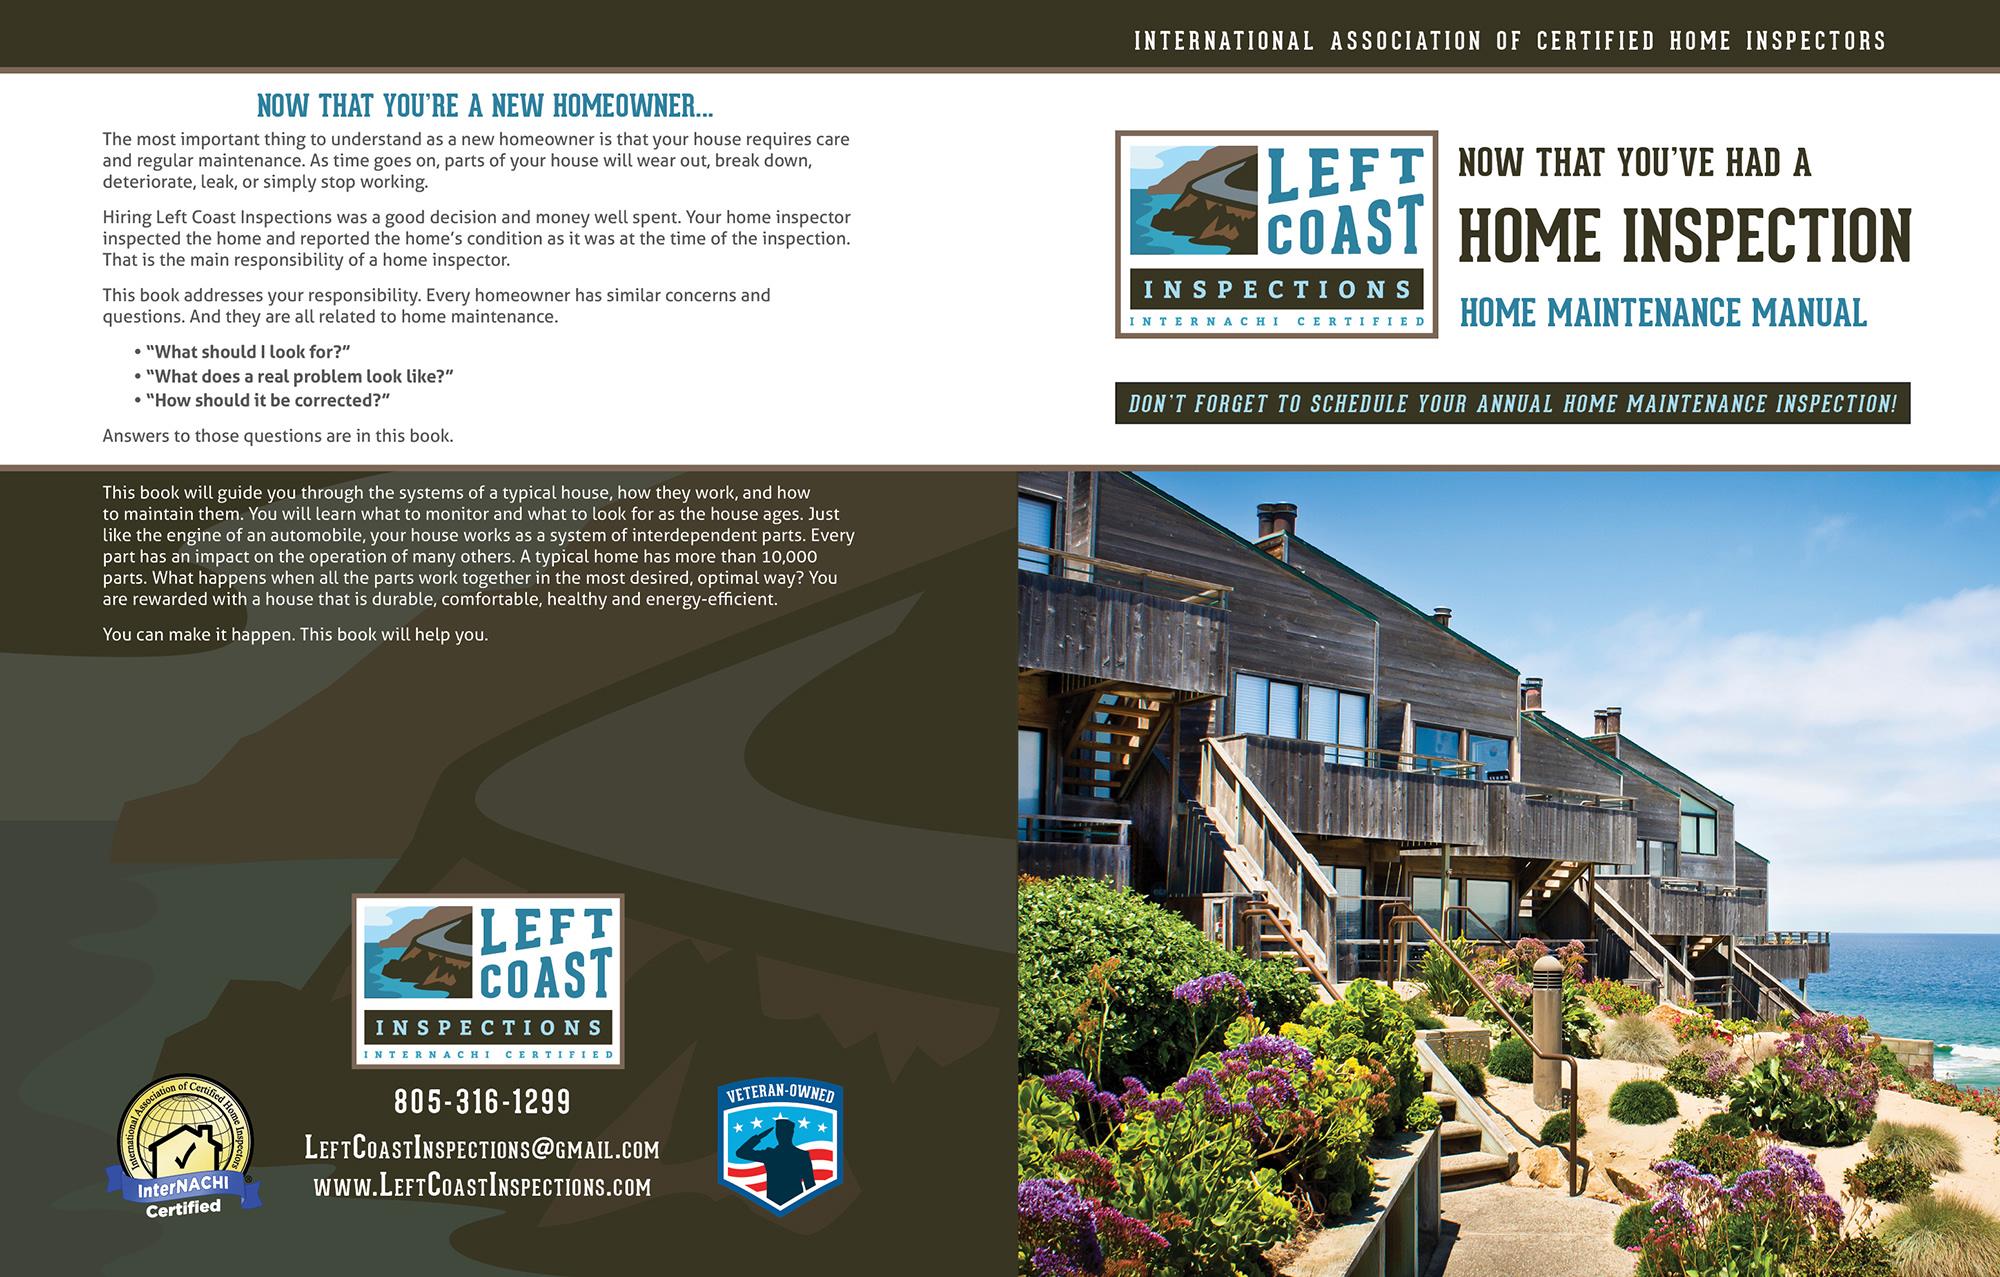 Custom Home Maintenance Book for Left Coast Inspections.